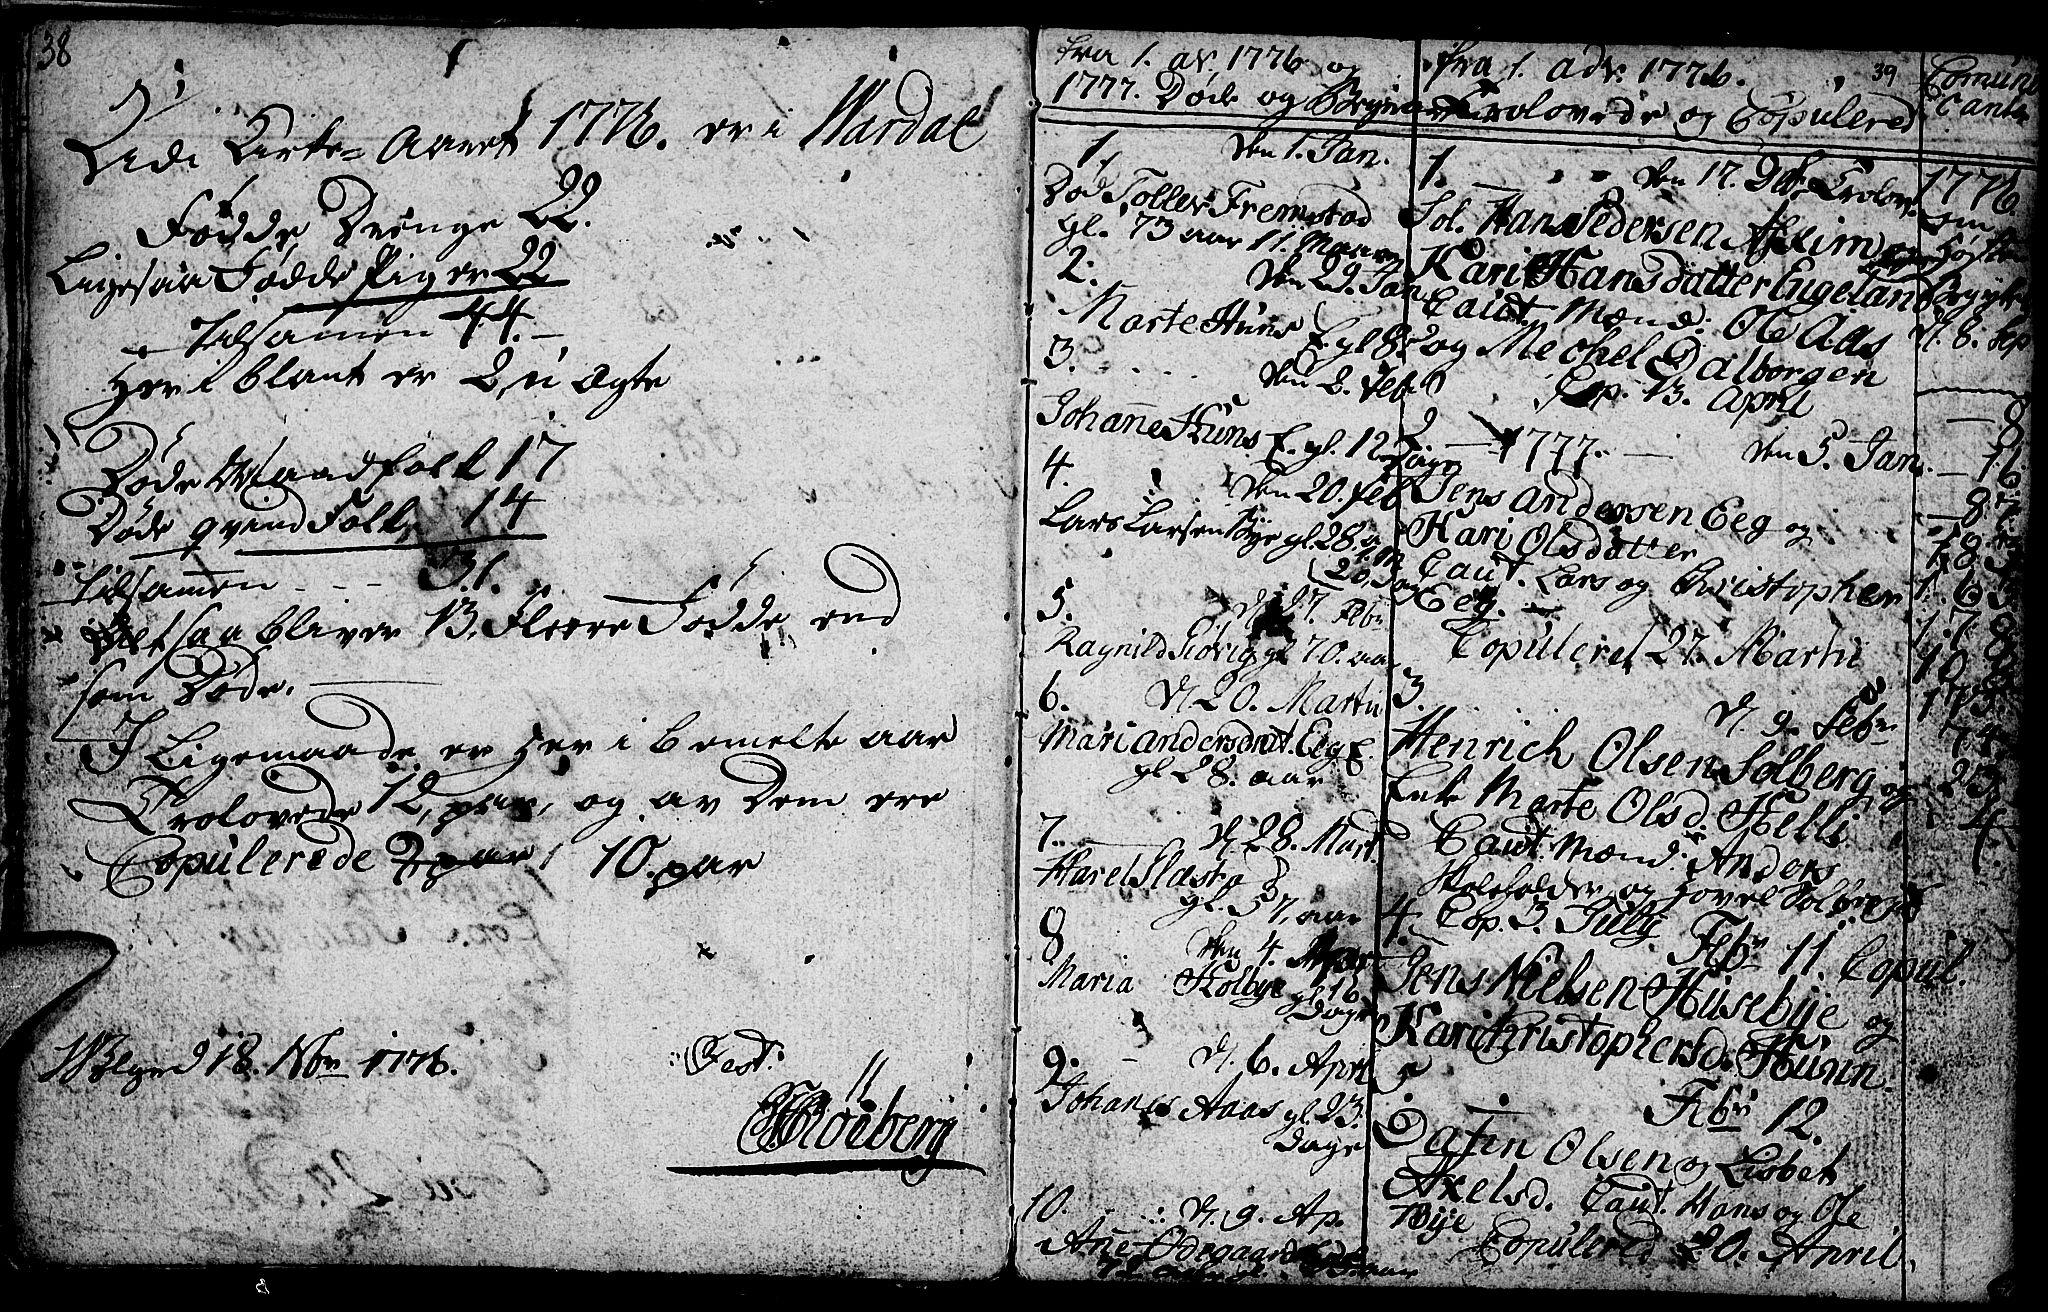 SAH, Vardal prestekontor, H/Ha/Hab/L0001: Klokkerbok nr. 1, 1771-1790, s. 38-39